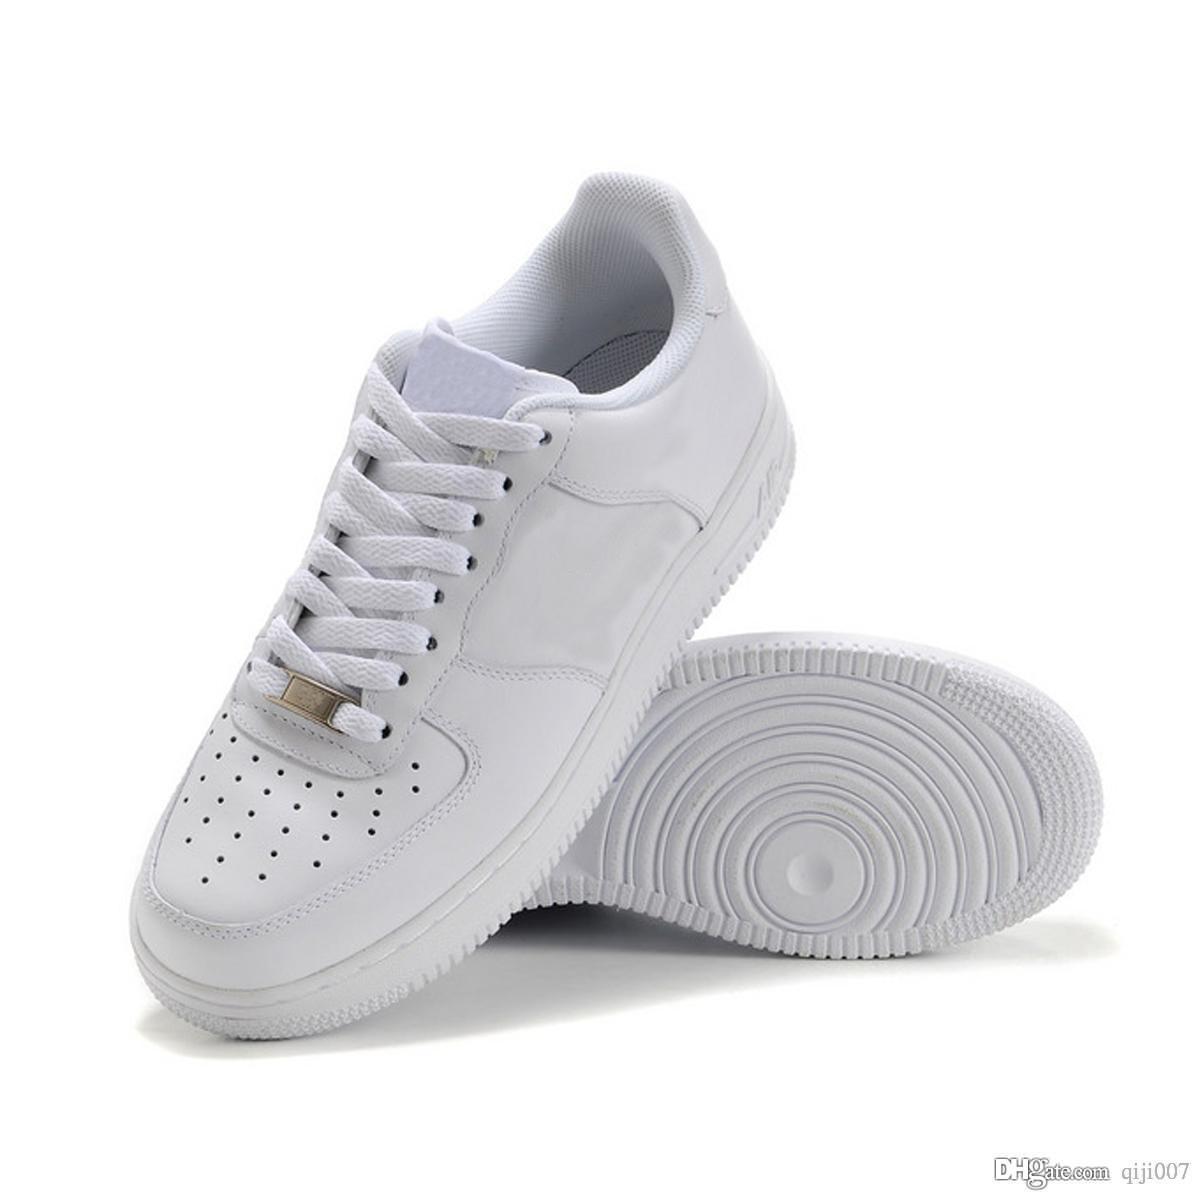 énorme réduction ac1af 3dbeb Nike air force one 1 Running shoes sneakers discount best-seller haute  qualité force hommes et femmes casual chaussures unisexe massage faible  pour ...